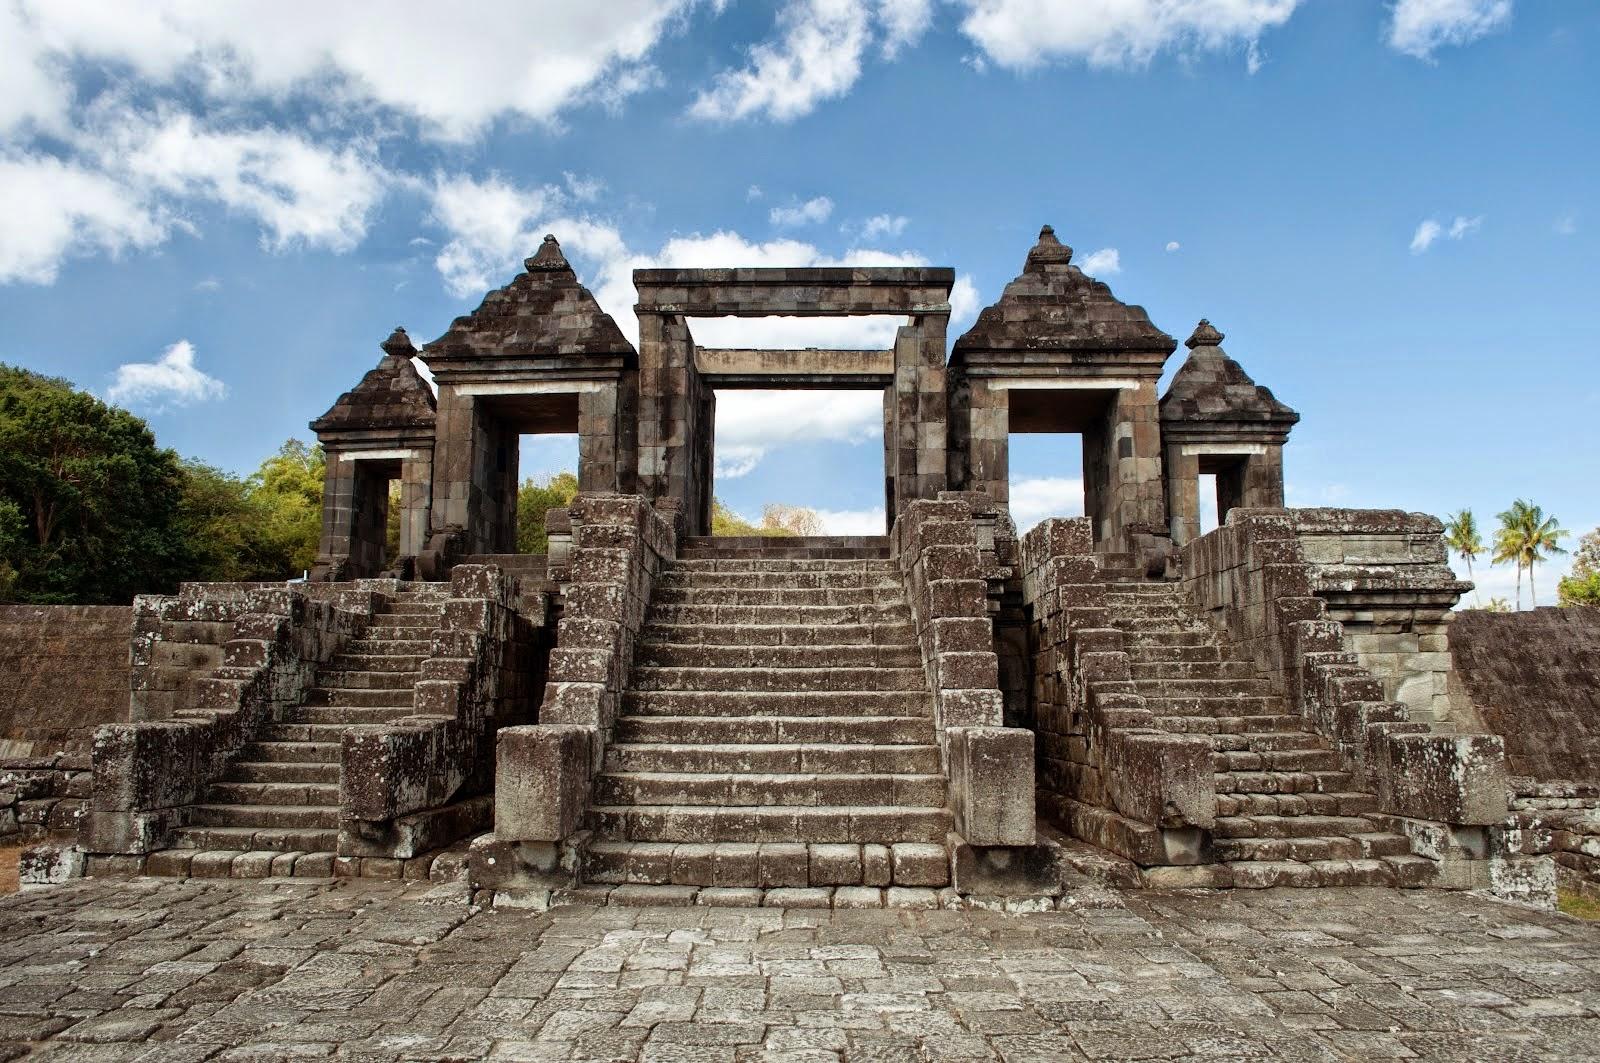 Candi Ratu Boko Tempat Wisata Jogja Istana Kab Sleman